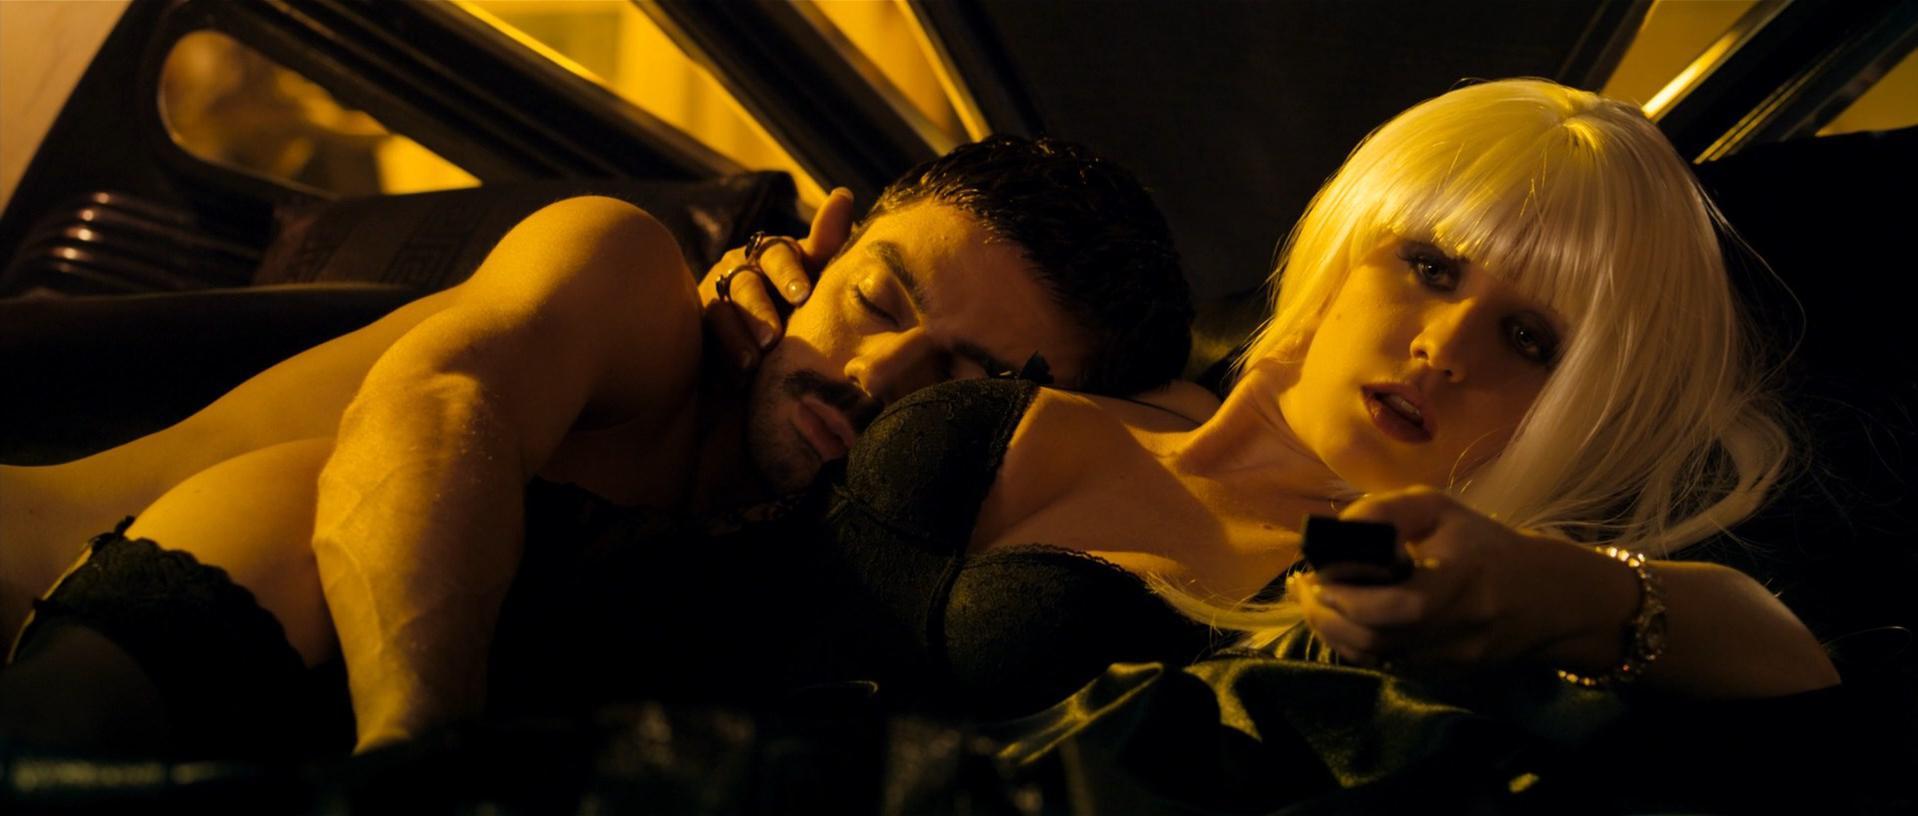 Ludivine Sagnier nude - The Devil's Double (2011)